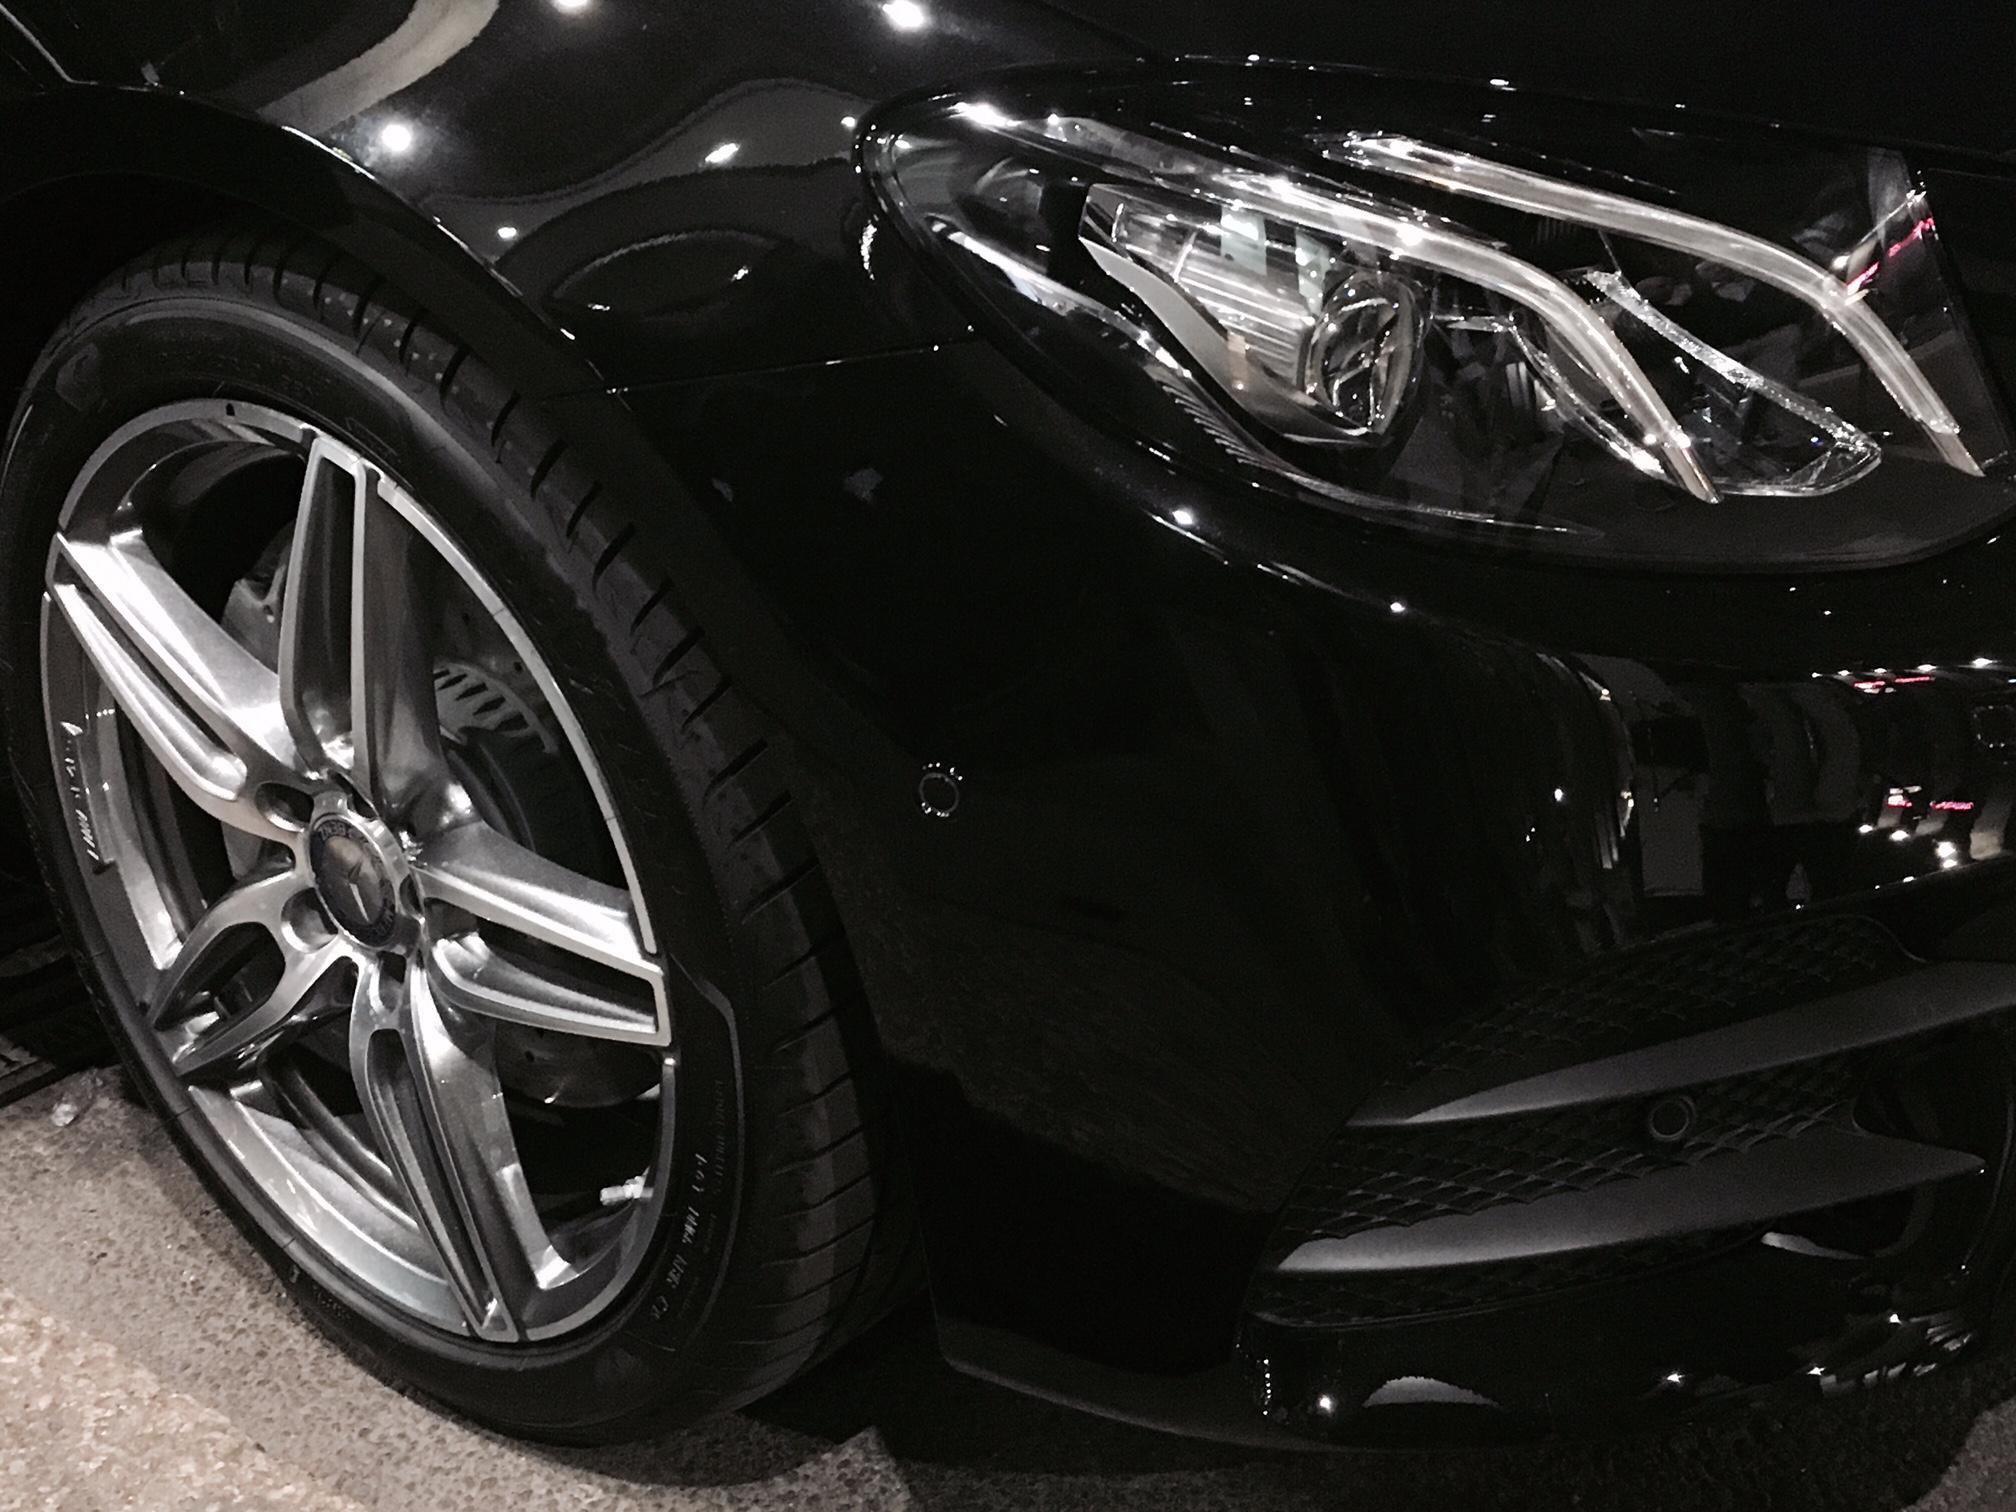 Mercedes Classe E MY2016 - anteprima a Milano